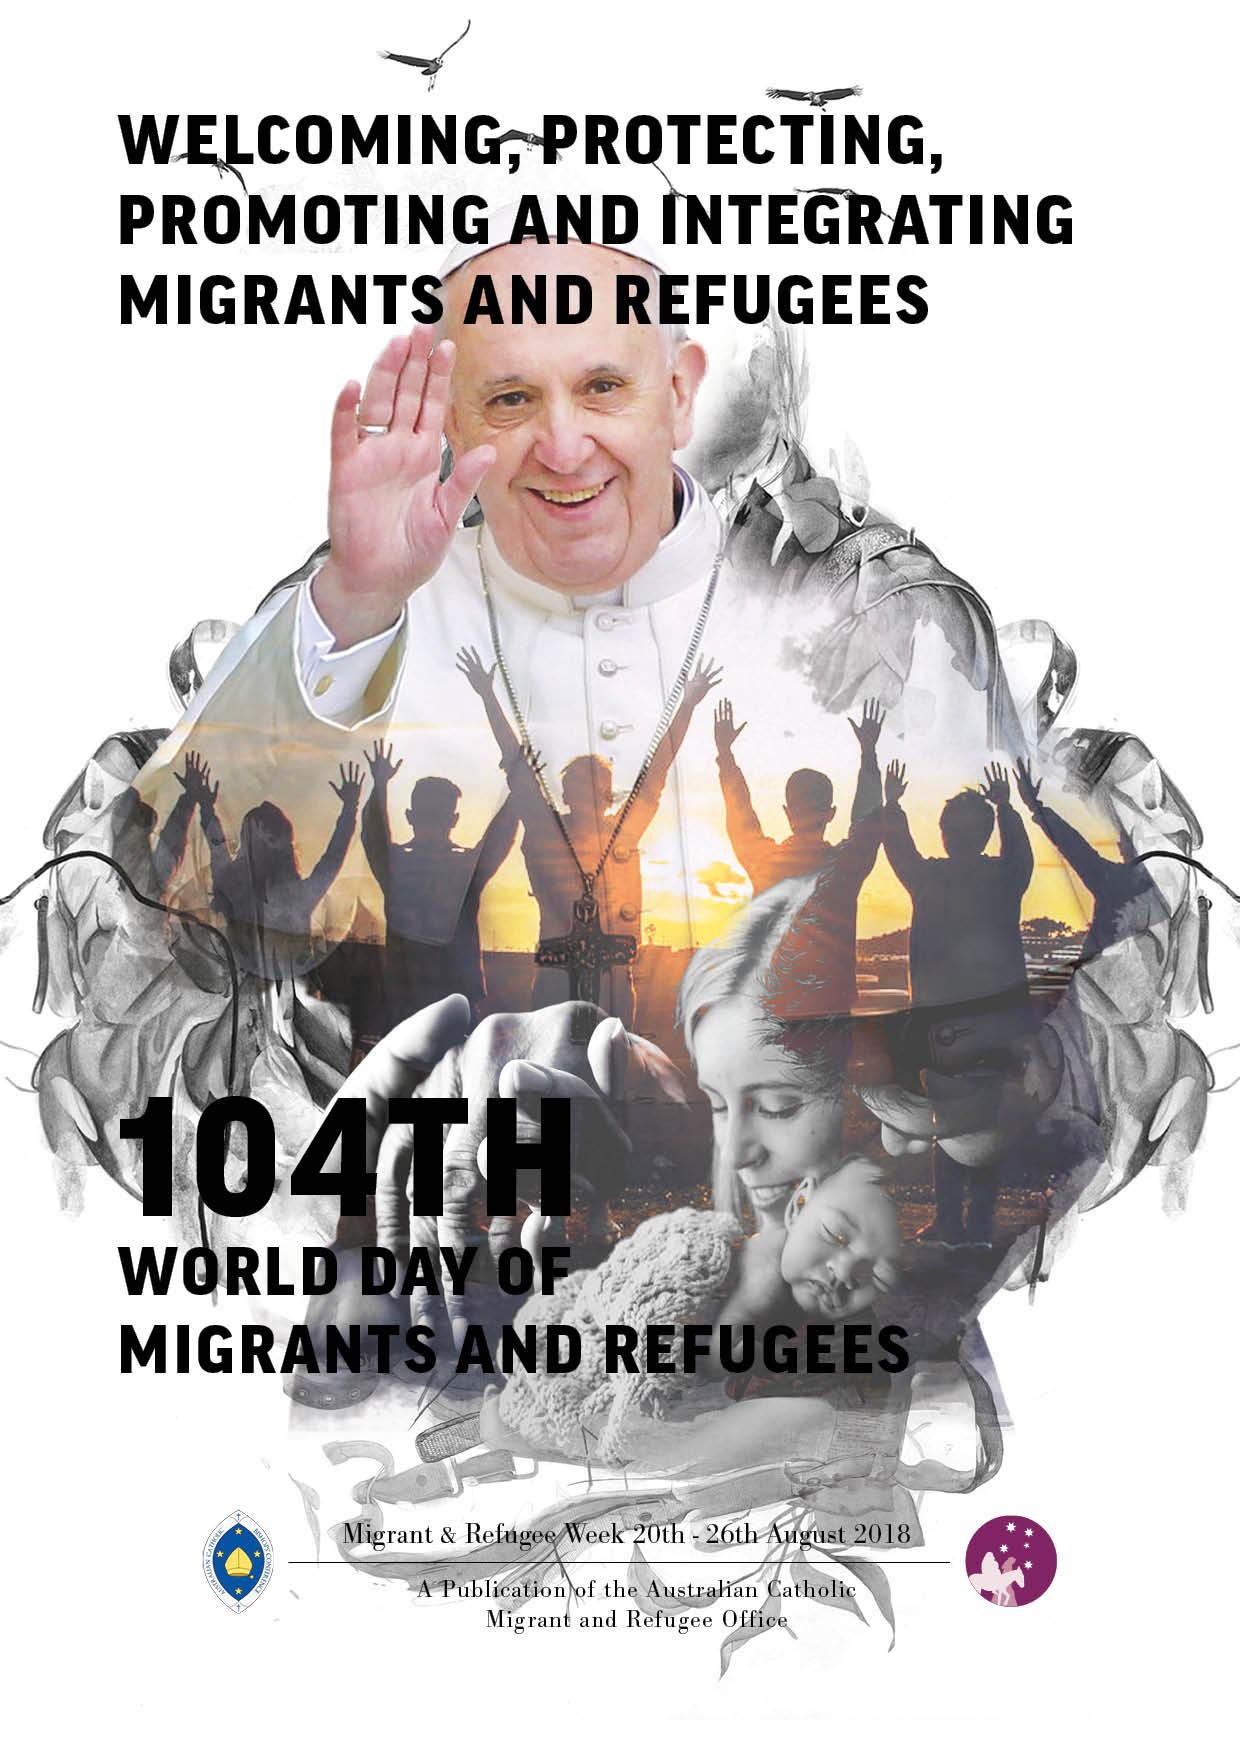 pope welcoming migrants